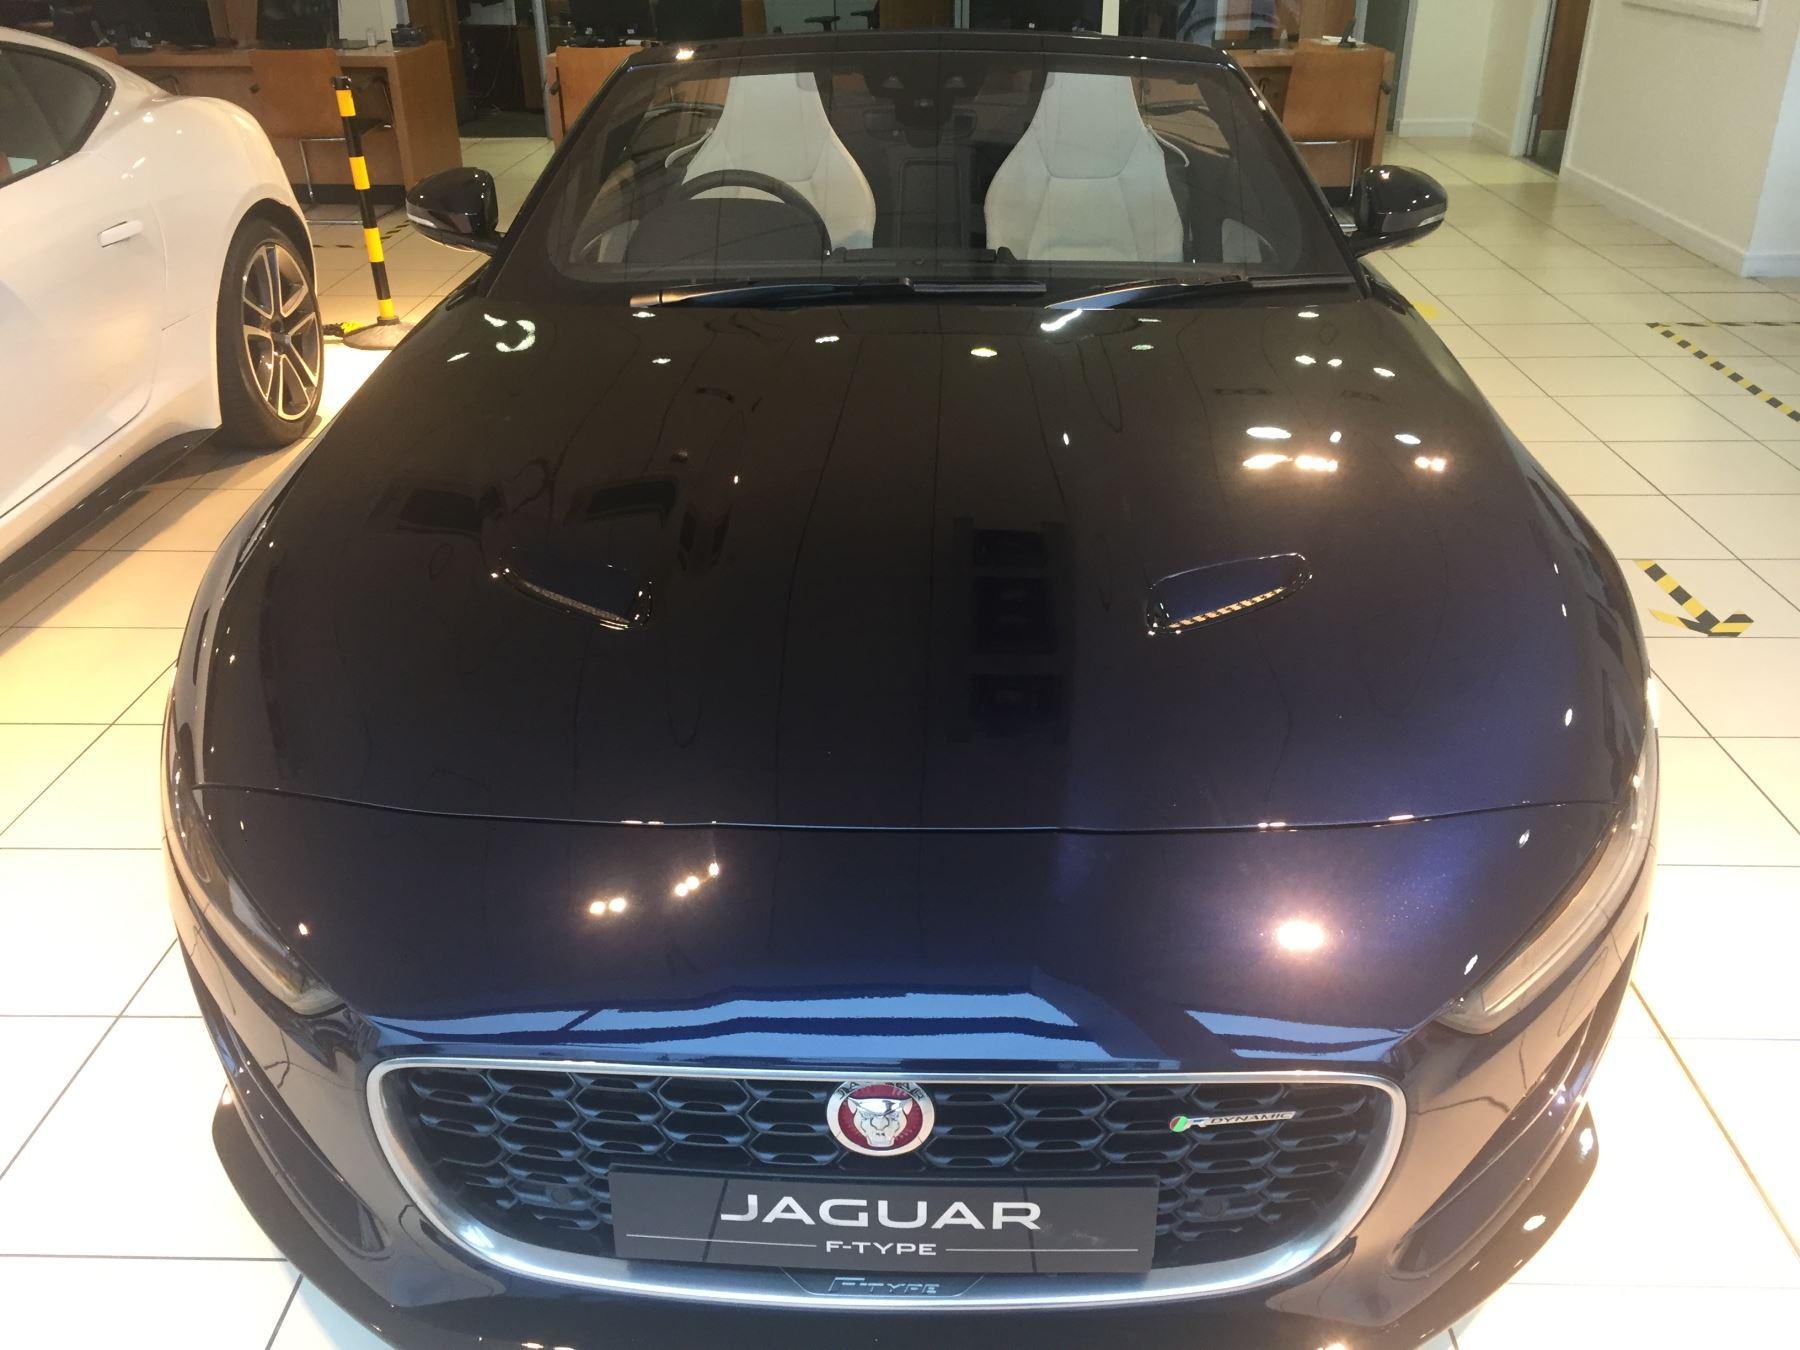 Jaguar F-TYPE 2.0 P300 R-Dynamic image 16